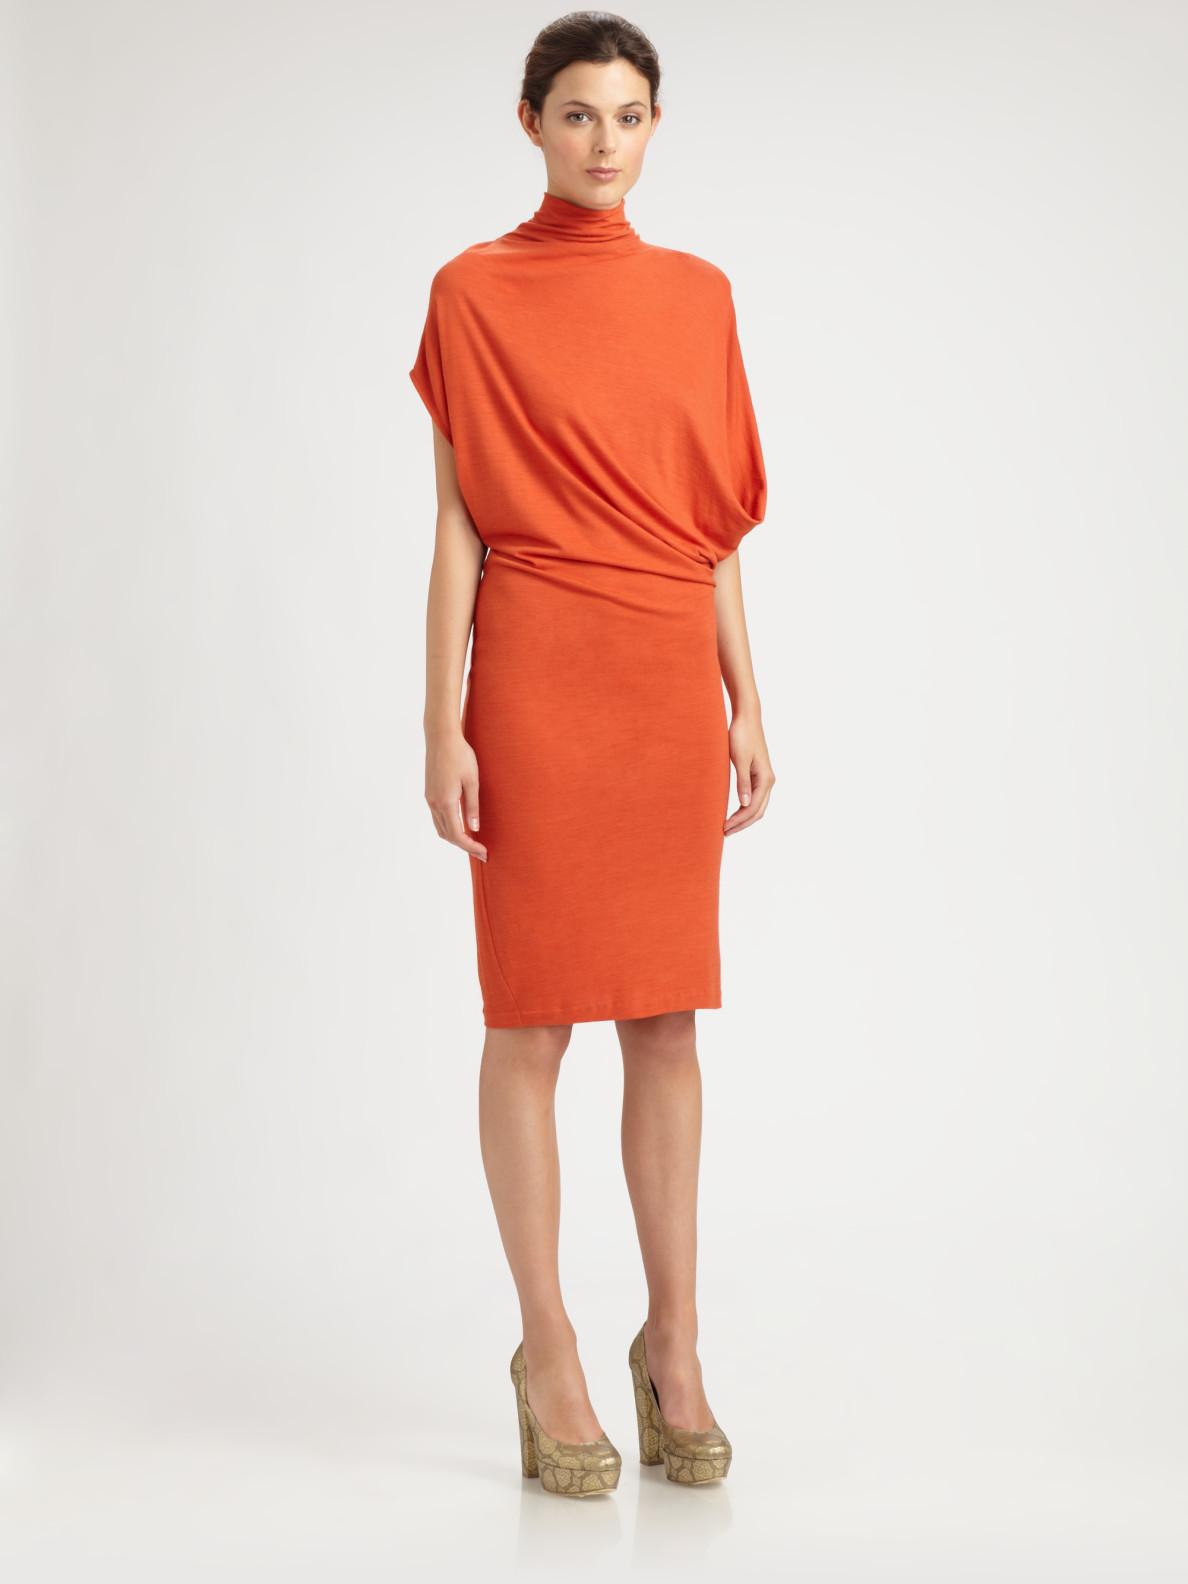 closet women belted gender brand next jersey dresses dress shop buttoned drapes womens category uk draped